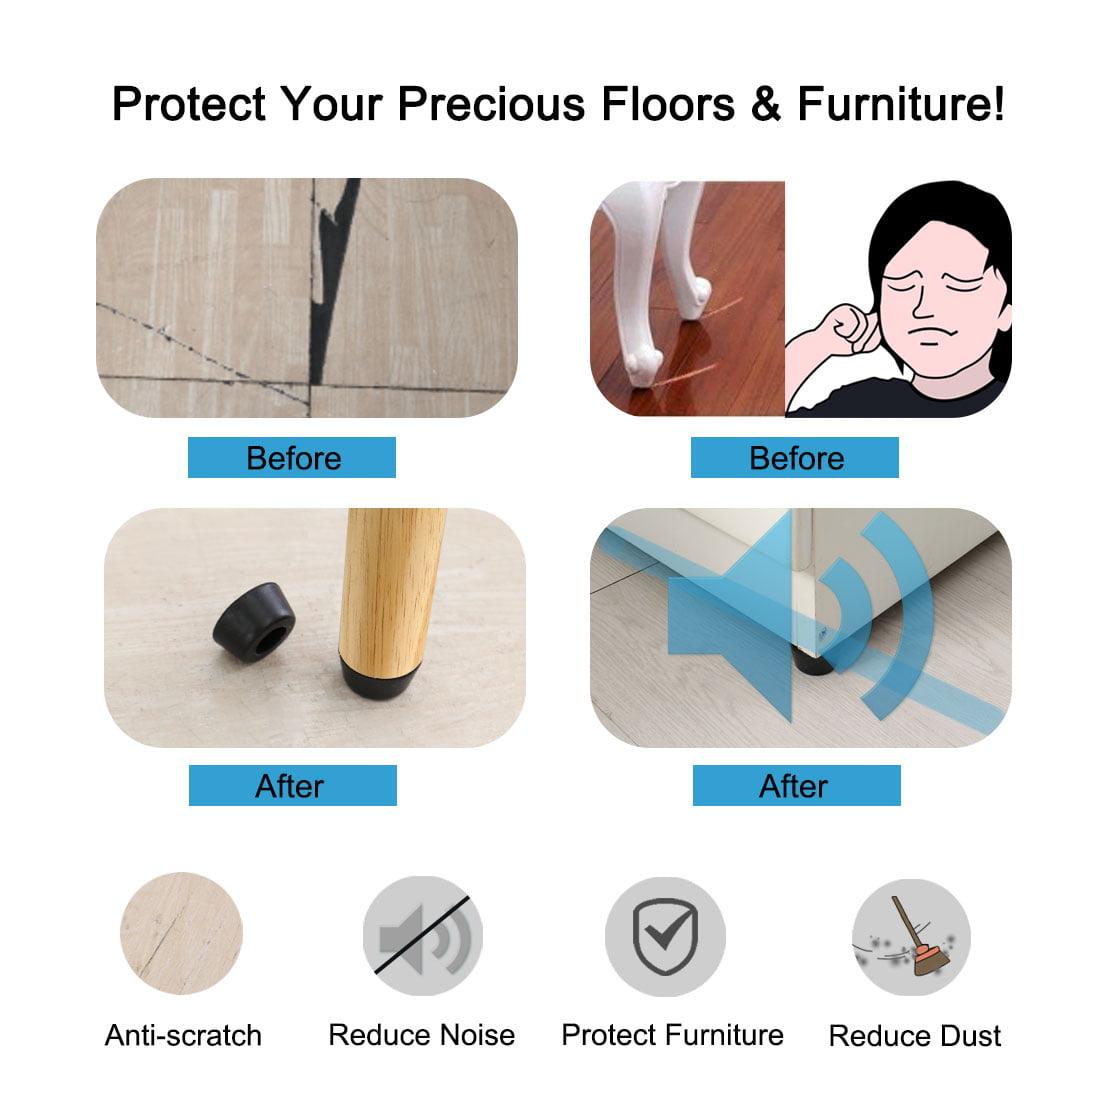 24pcs Rubber Feet Bumper Furniture Speaker Cabinet Leg Pads, D47x32xH29mm - image 3 of 7